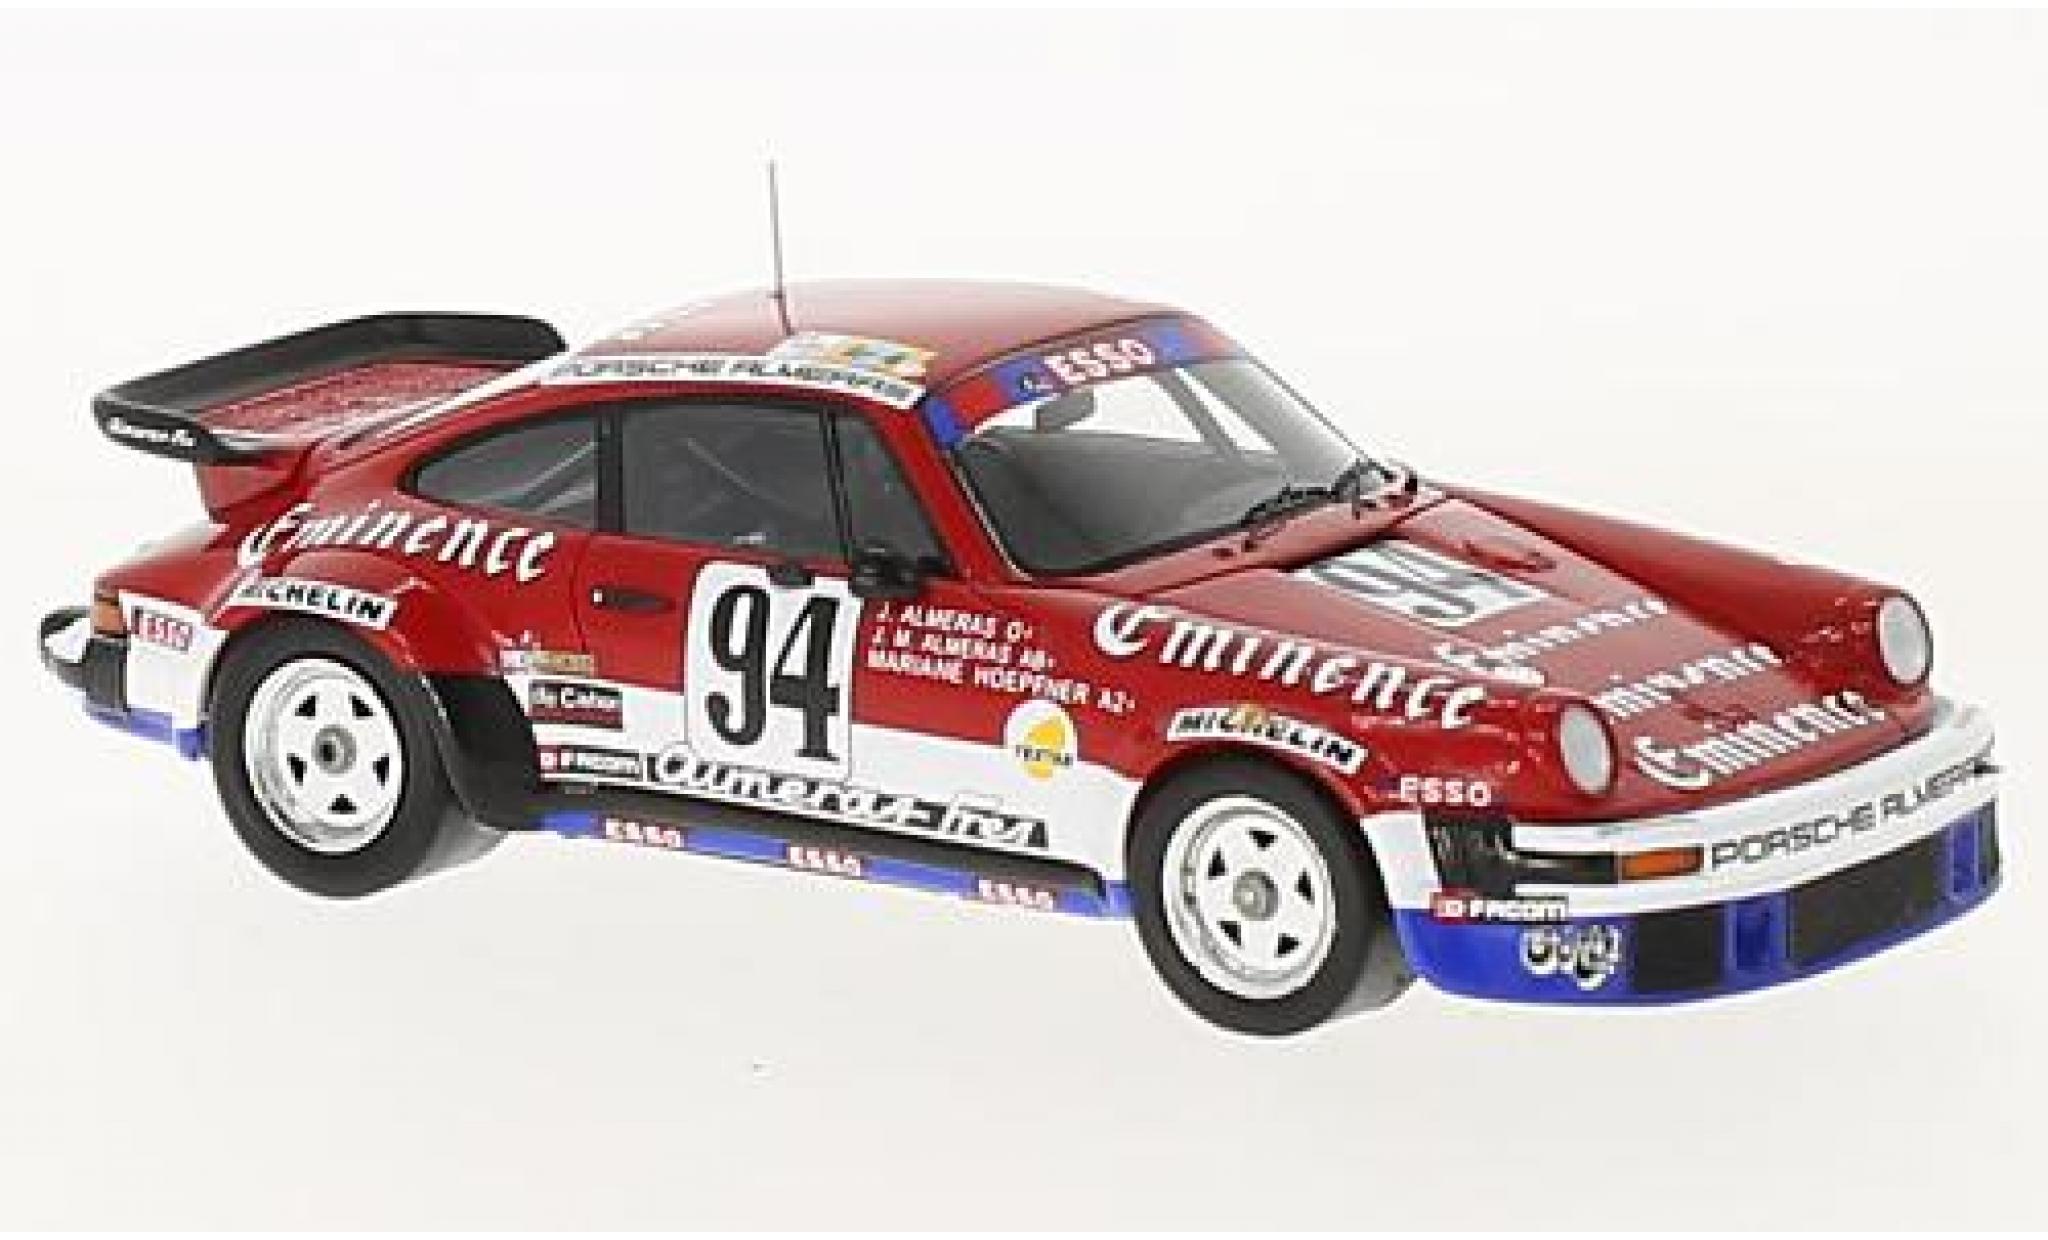 Porsche 934 1/43 Spark No.94 Eminence 24h Le Mans 1980 J.Almeras/J-M.Almeras/M.Hoepfner